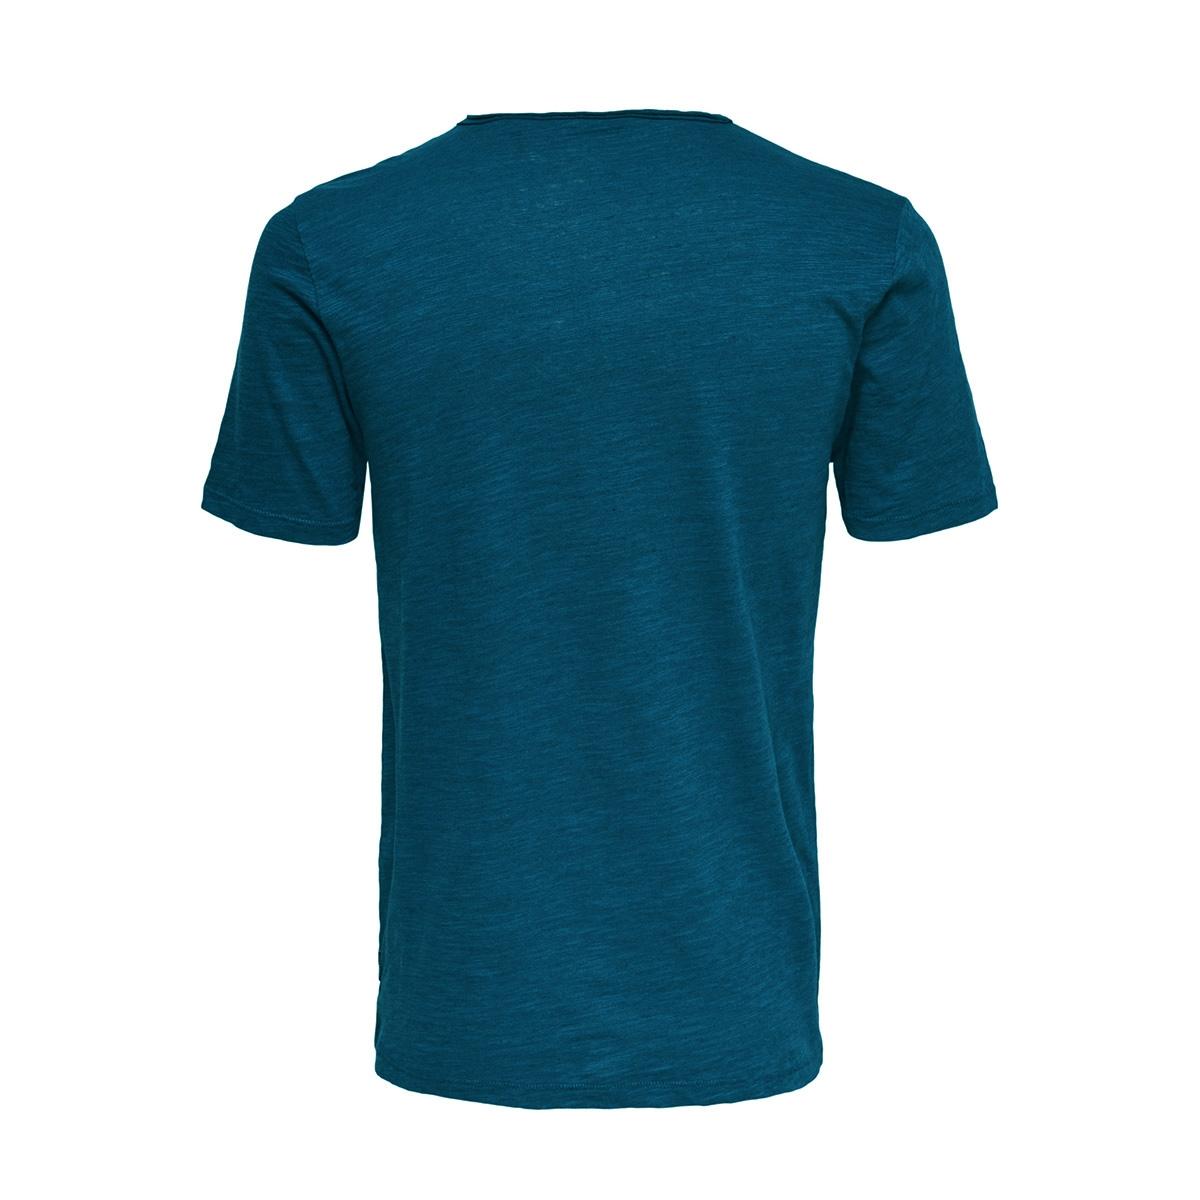 onsalbert new ss tee noos 22005108 only & sons t-shirt majolica blue